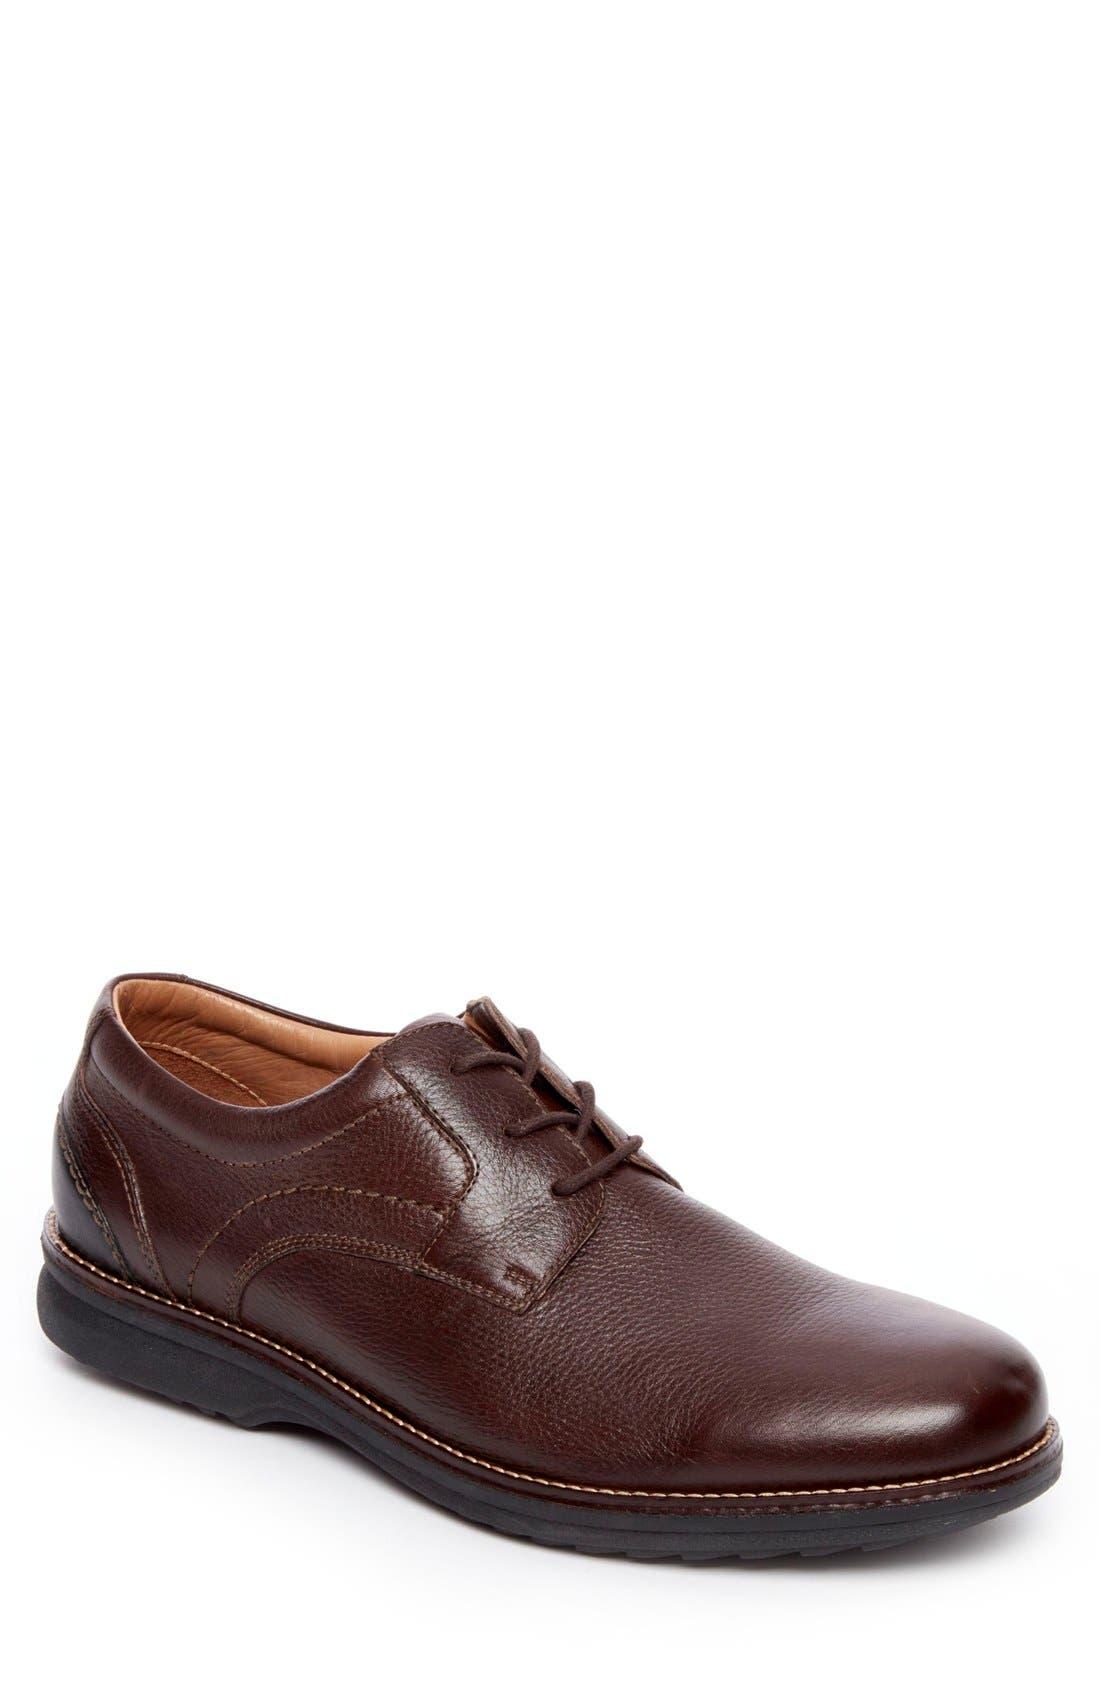 Alternate Image 1 Selected - Rockport 'Premium Class' Plain Toe Derby (Men)